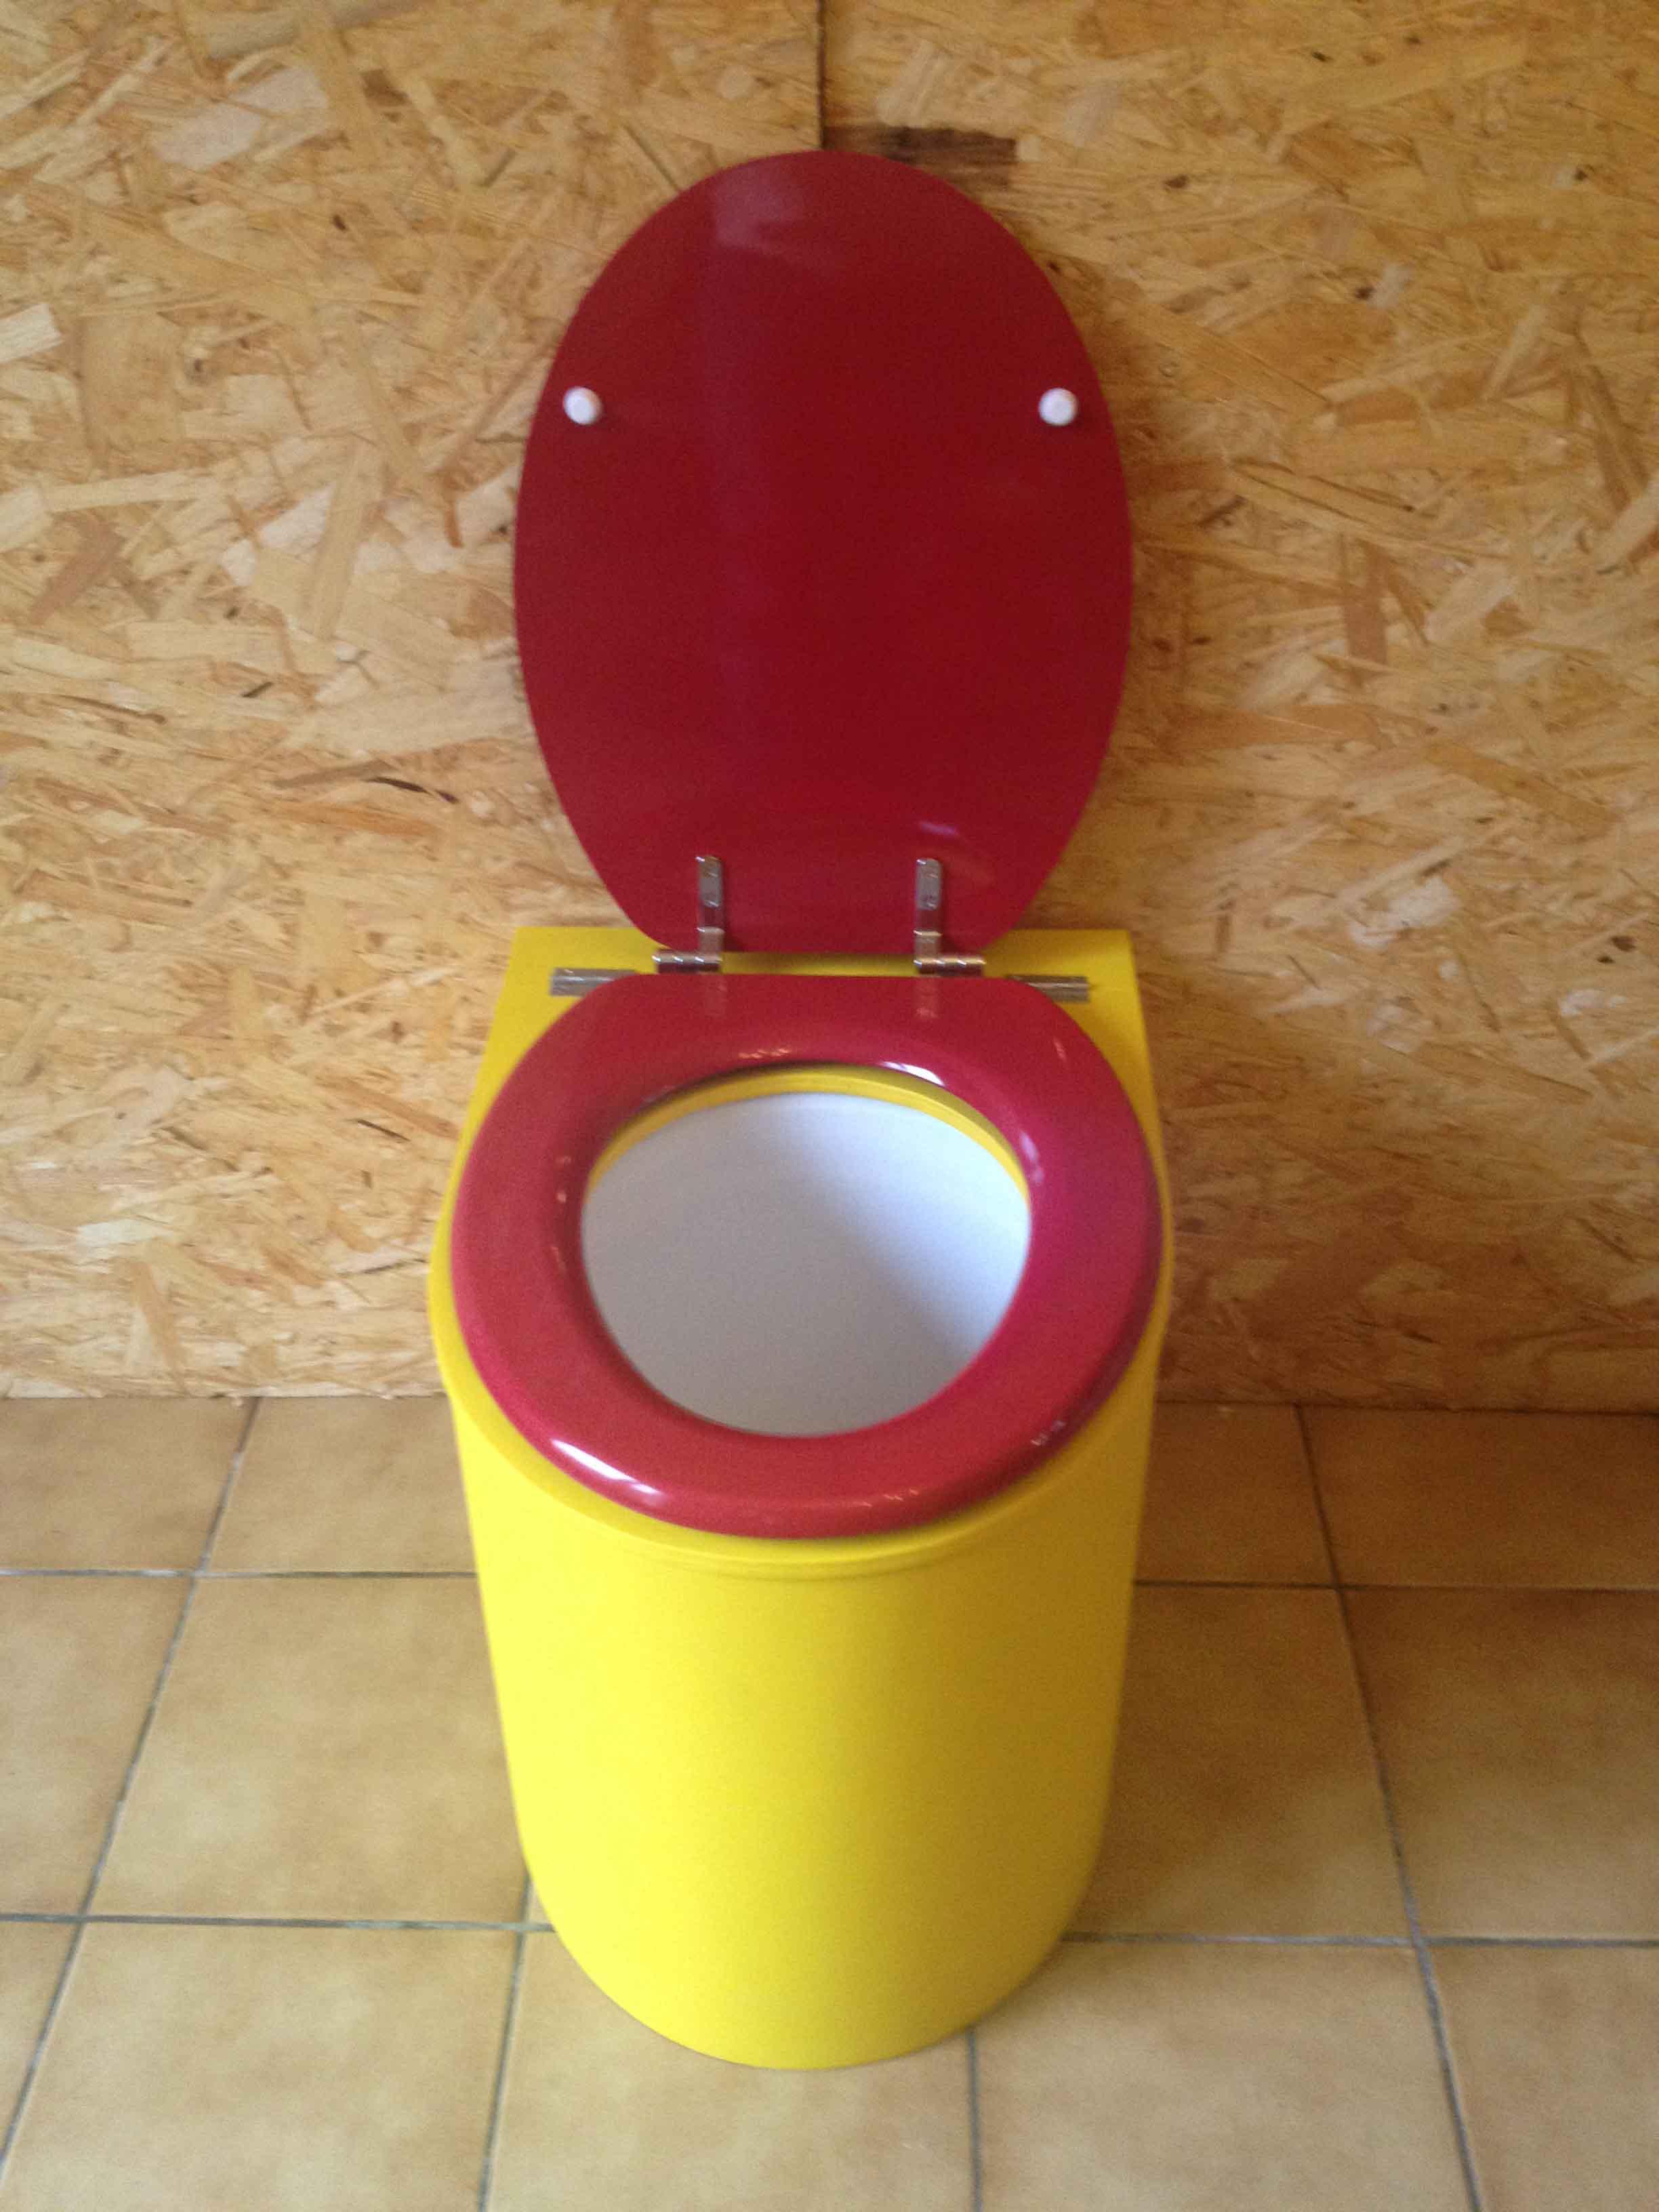 Toilette sèche moderne jaune